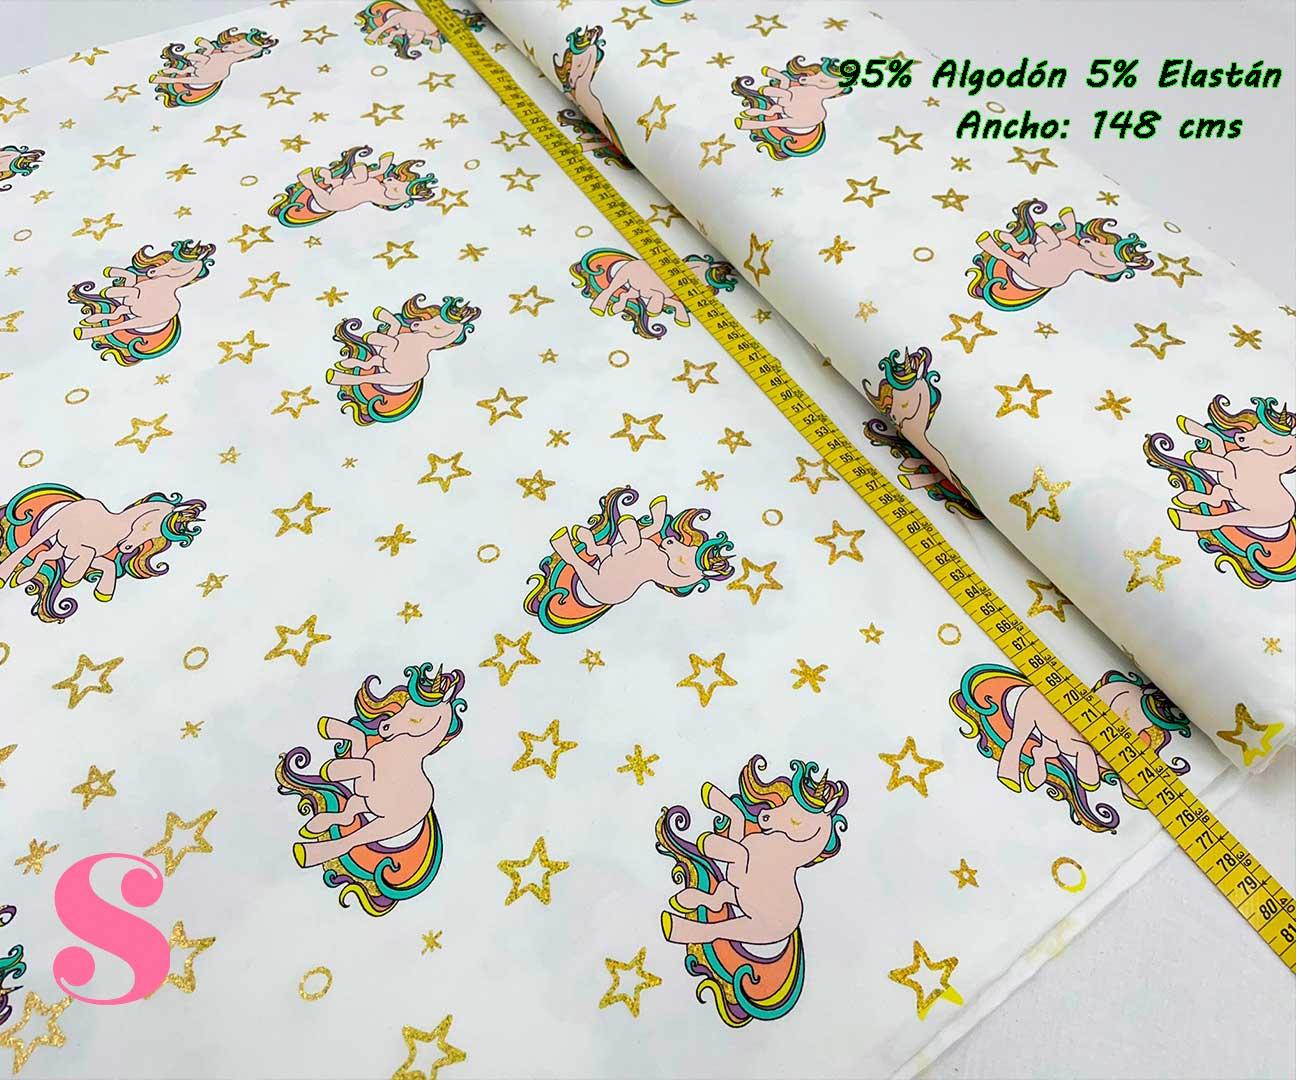 16-telas-de-punto-estampadas,punto-camiseta-estampado,punto-sudadera-estampado,french-terry-estampado,Punto Camiseta Jersey Estampado Unicornio Estrellas